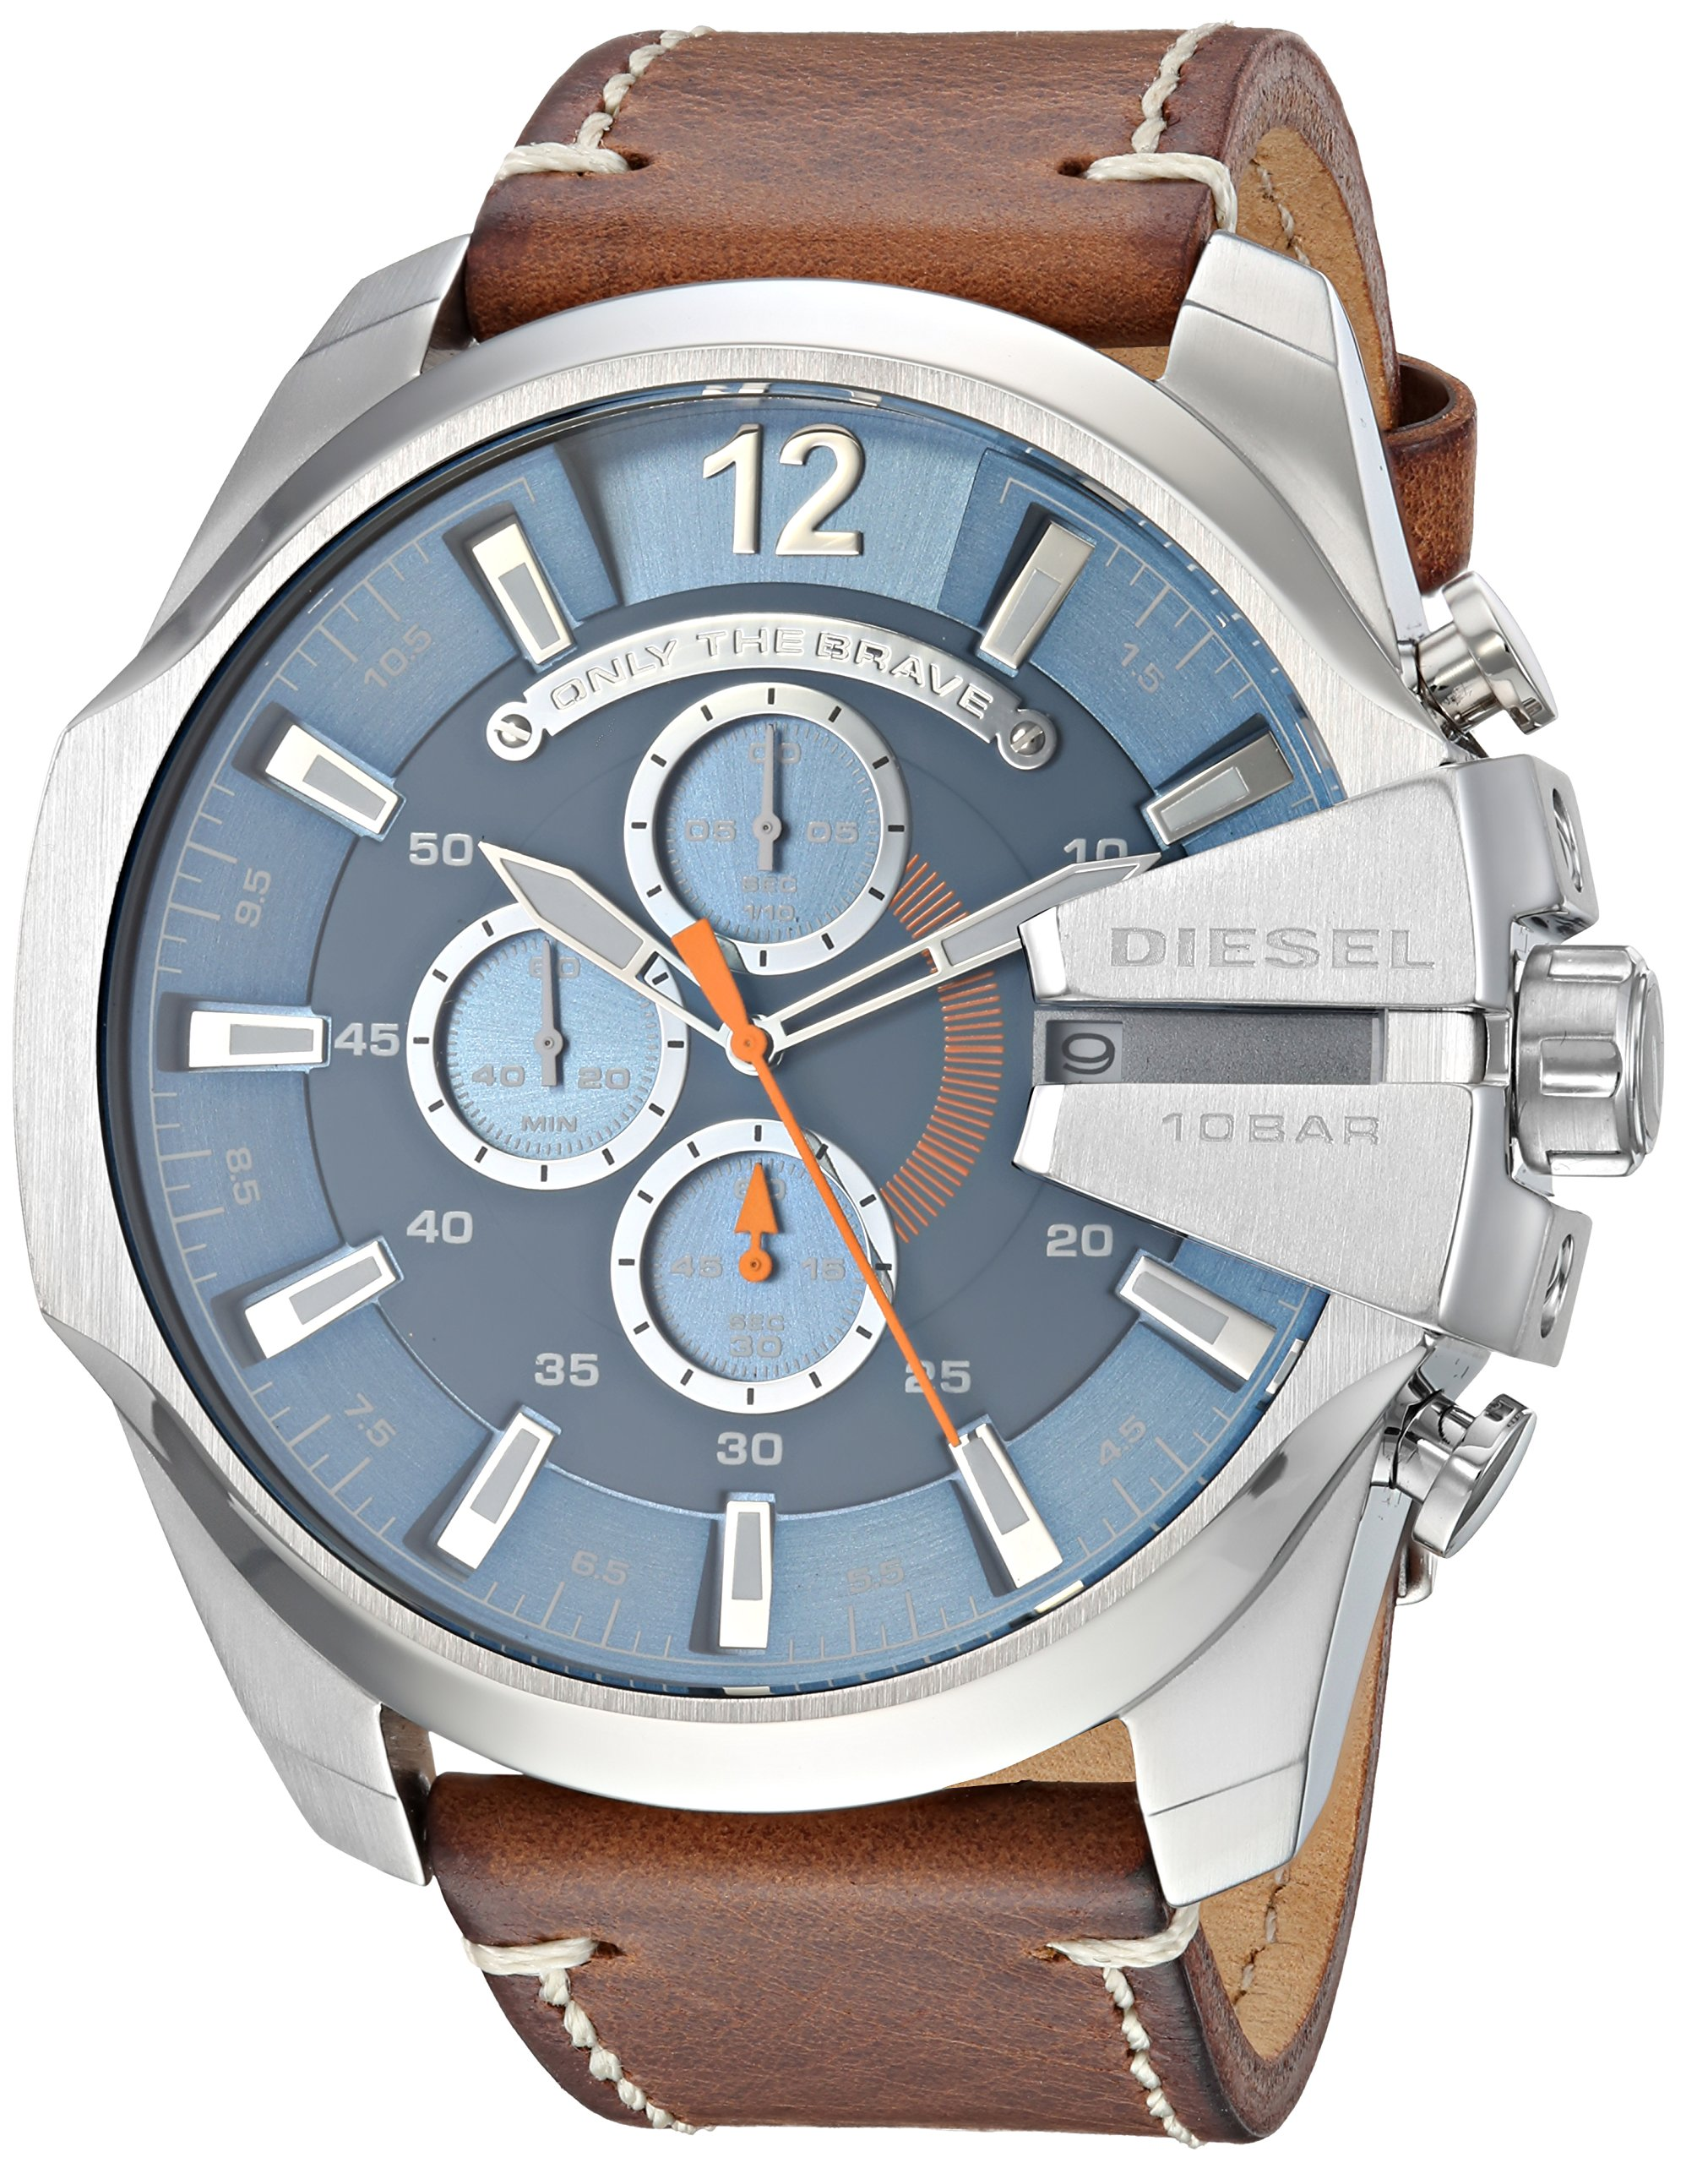 Diesel Men's Mega Chief Stainless Steel Japanese-Quartz Watch with Leather Calfskin Strap, Brown, 26 (Model: DZ4458) by Diesel